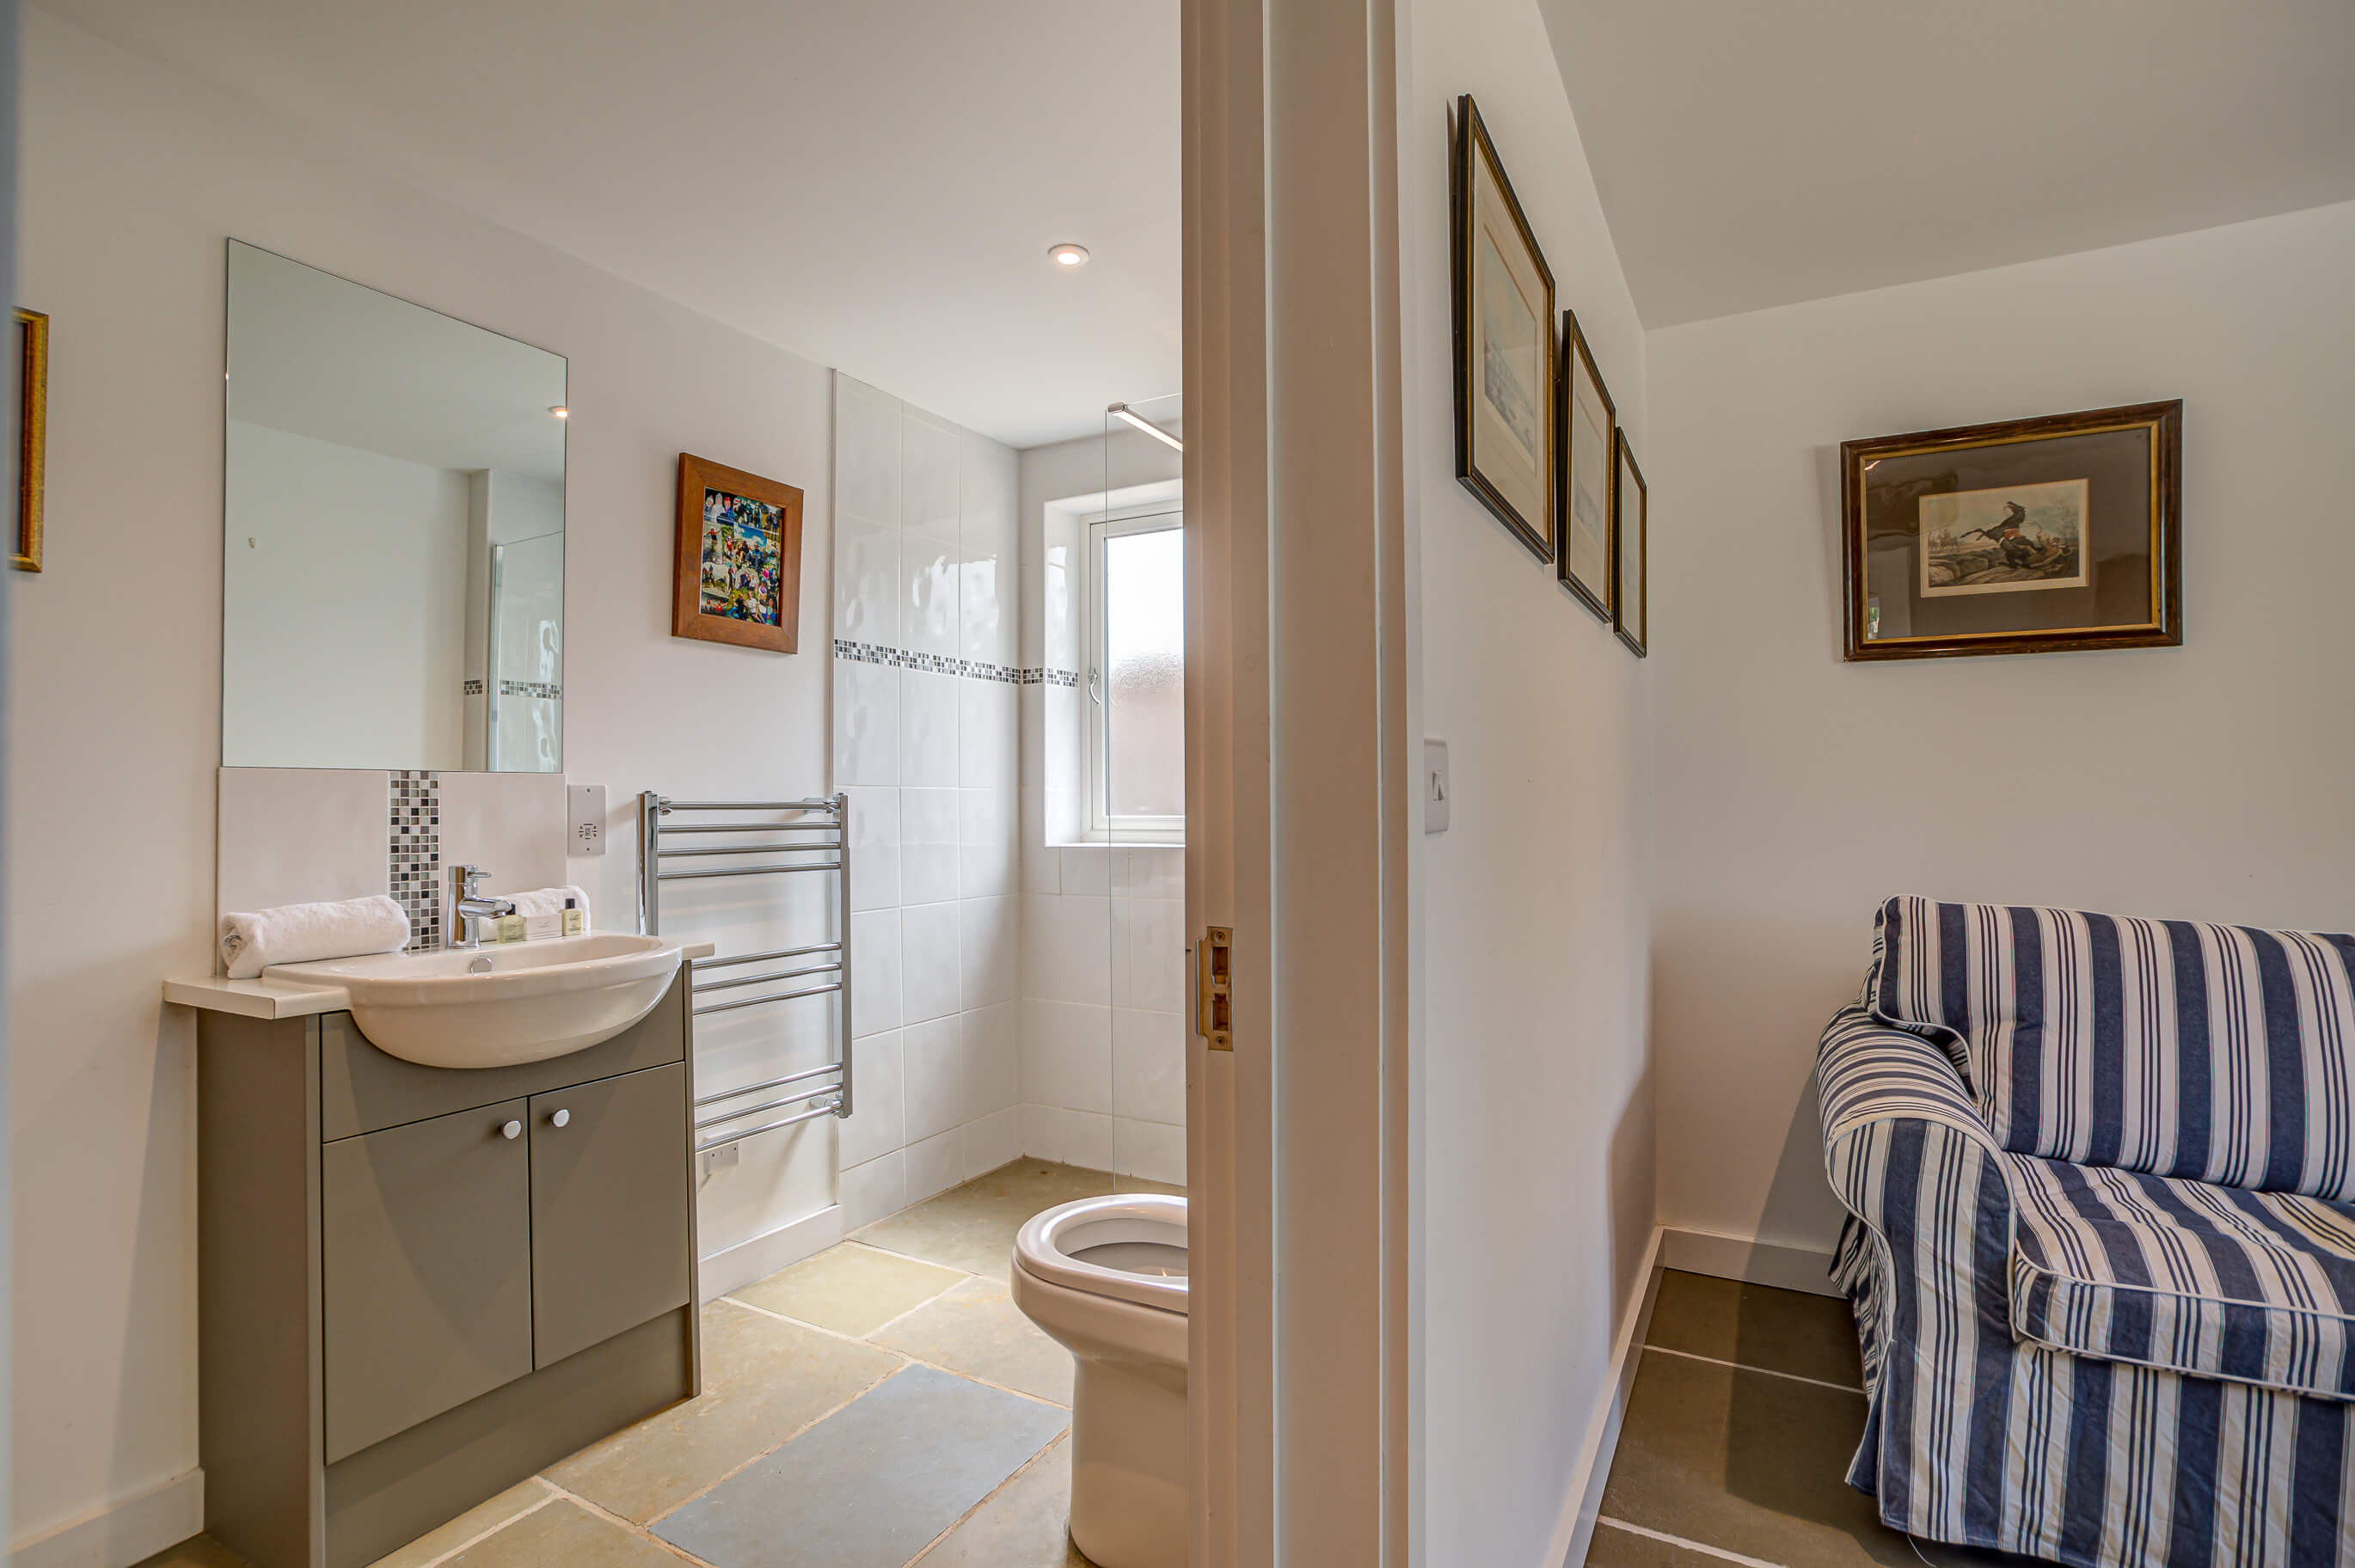 Old Barn Witney Bedroom 3 Bathroom